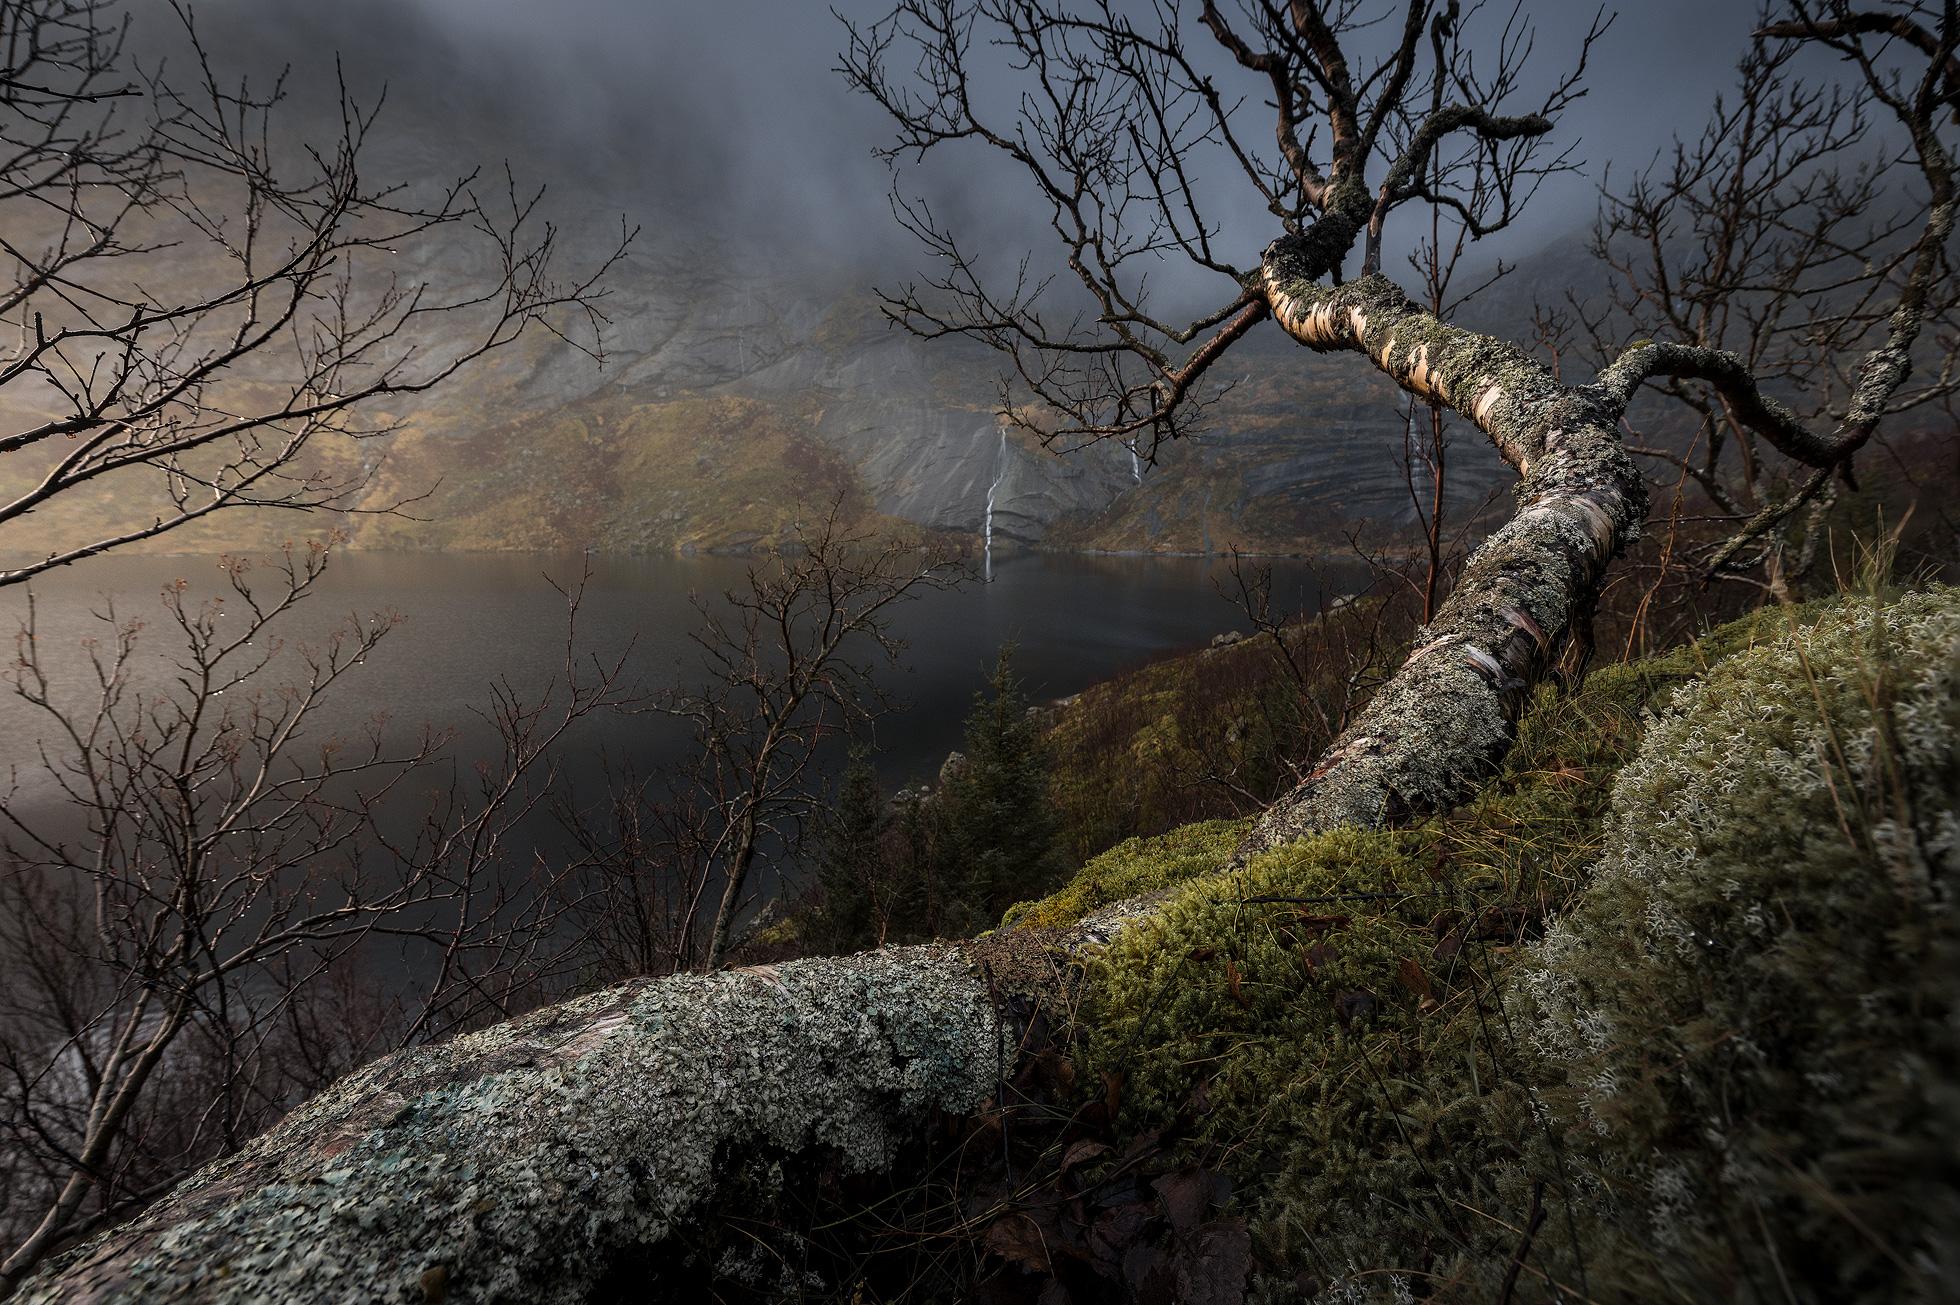 Lofoten-Storvatnet-11-2018-1.jpg